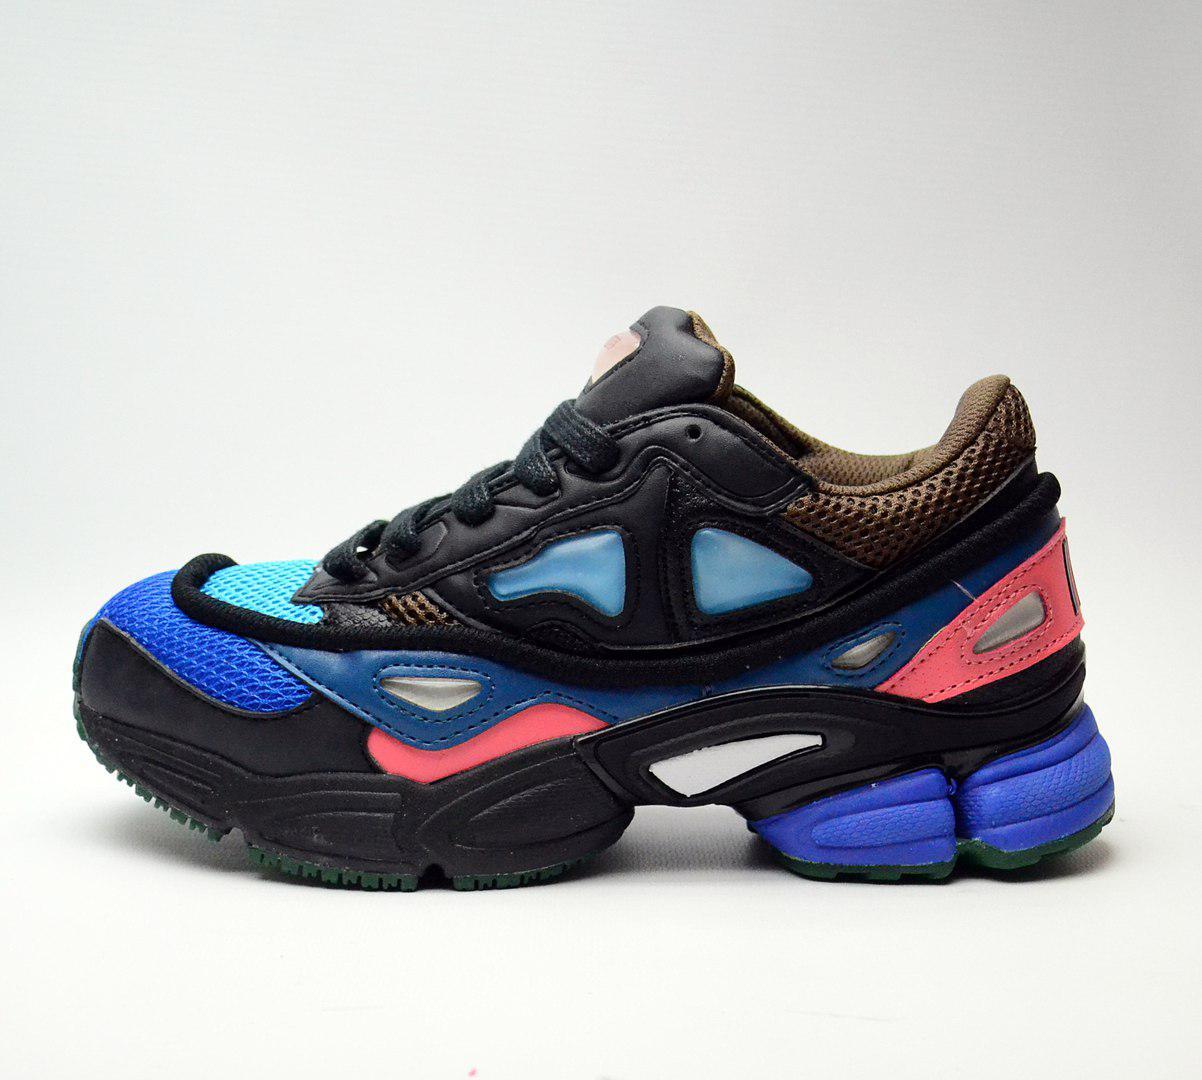 1534c19b Мужские кроссовки Adidas Raf Simons Ozweego 2, Копия: продажа, цена ...